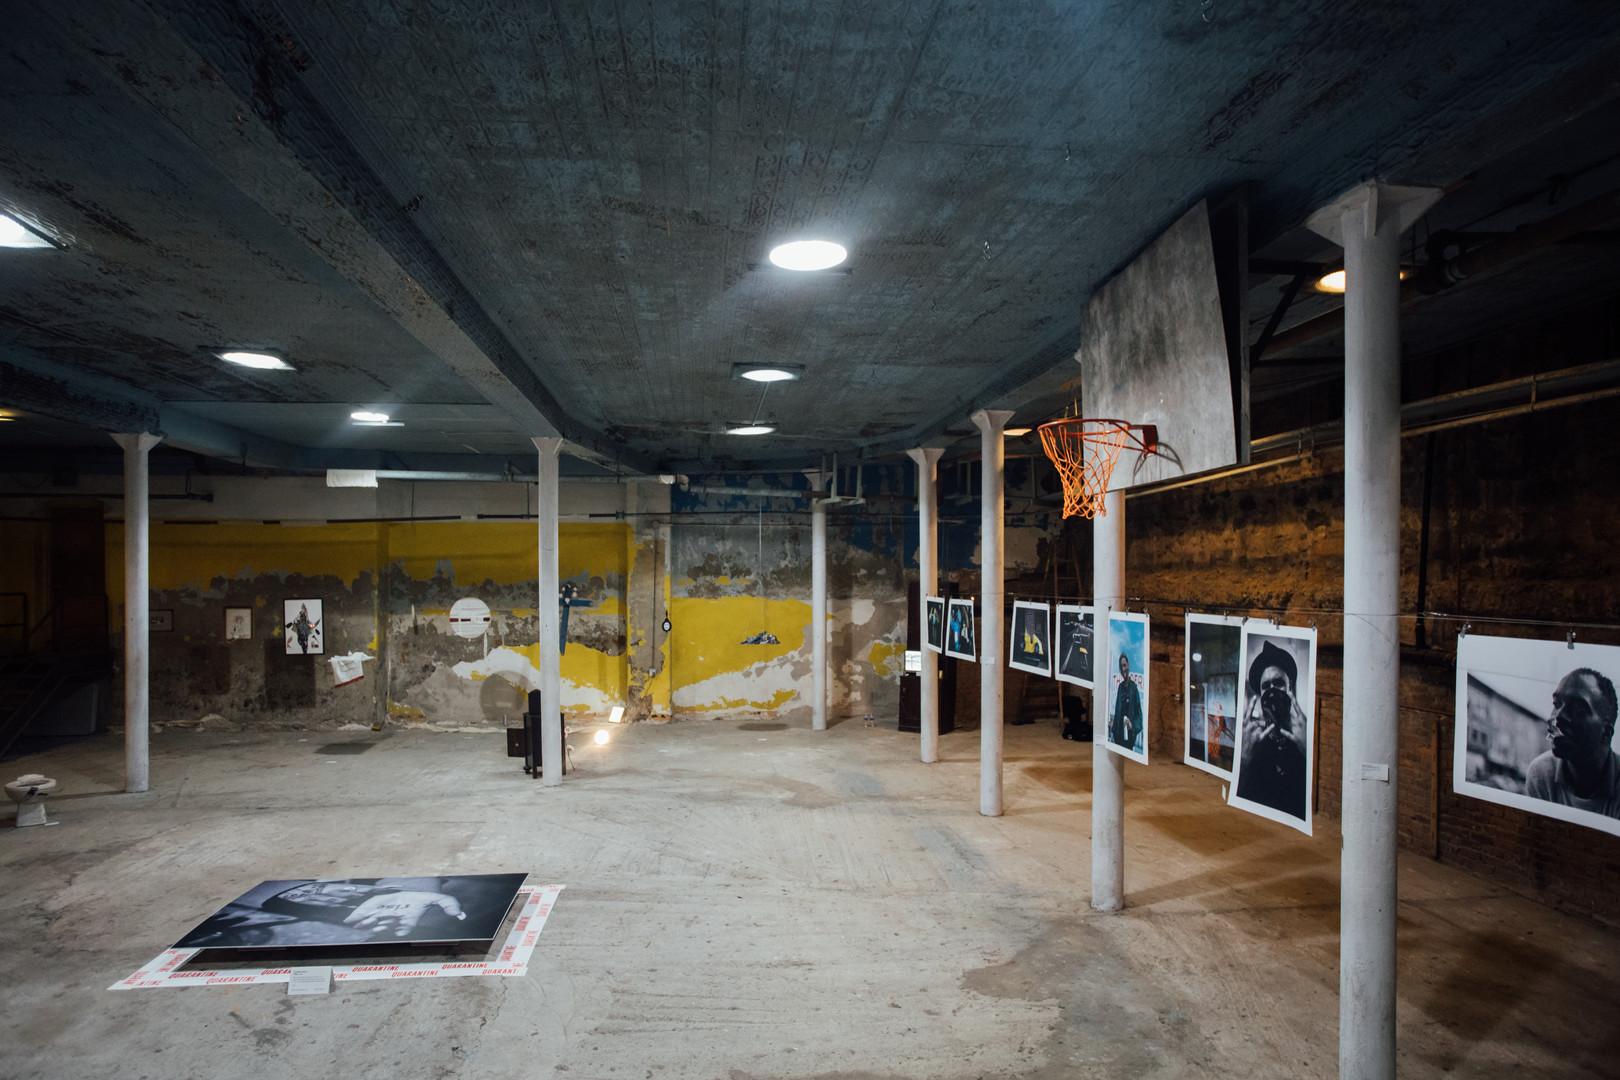 Phase IV art exhibition at Gymnopedie, Brooklyn 12.06.2020